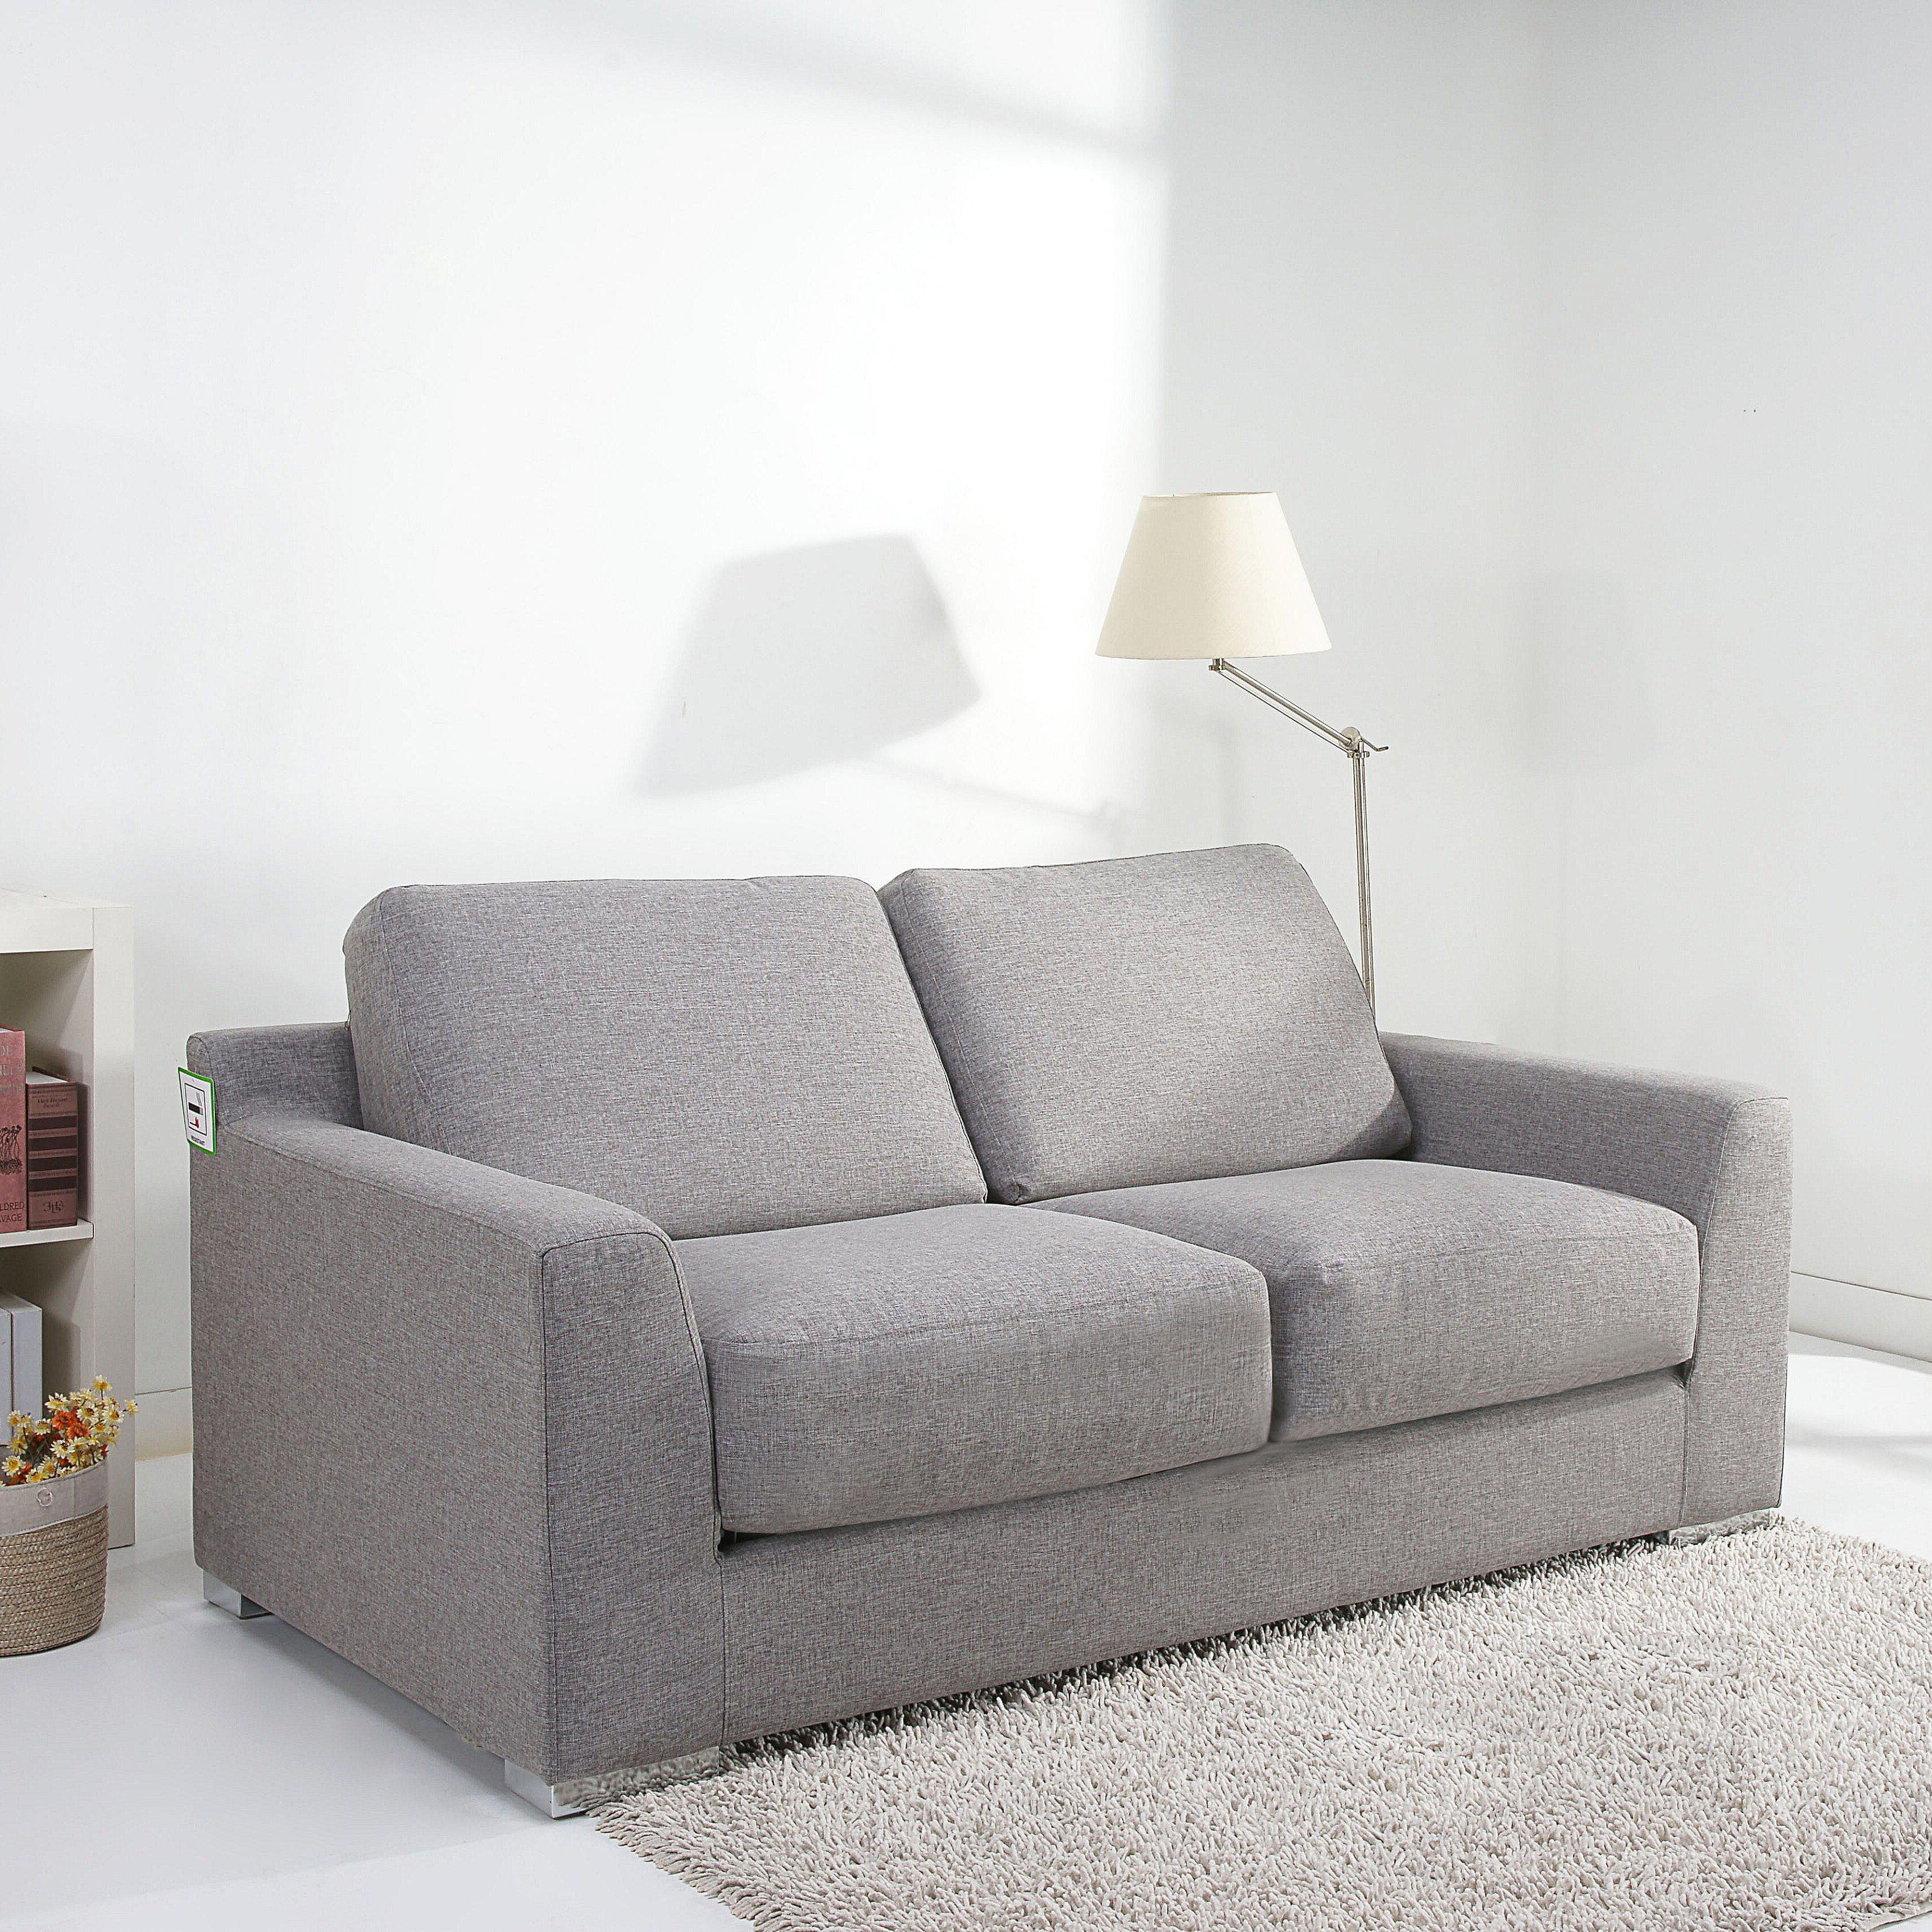 leader lifestyle paris 2 seater fold out sofa bed reviews wayfair uk. Black Bedroom Furniture Sets. Home Design Ideas